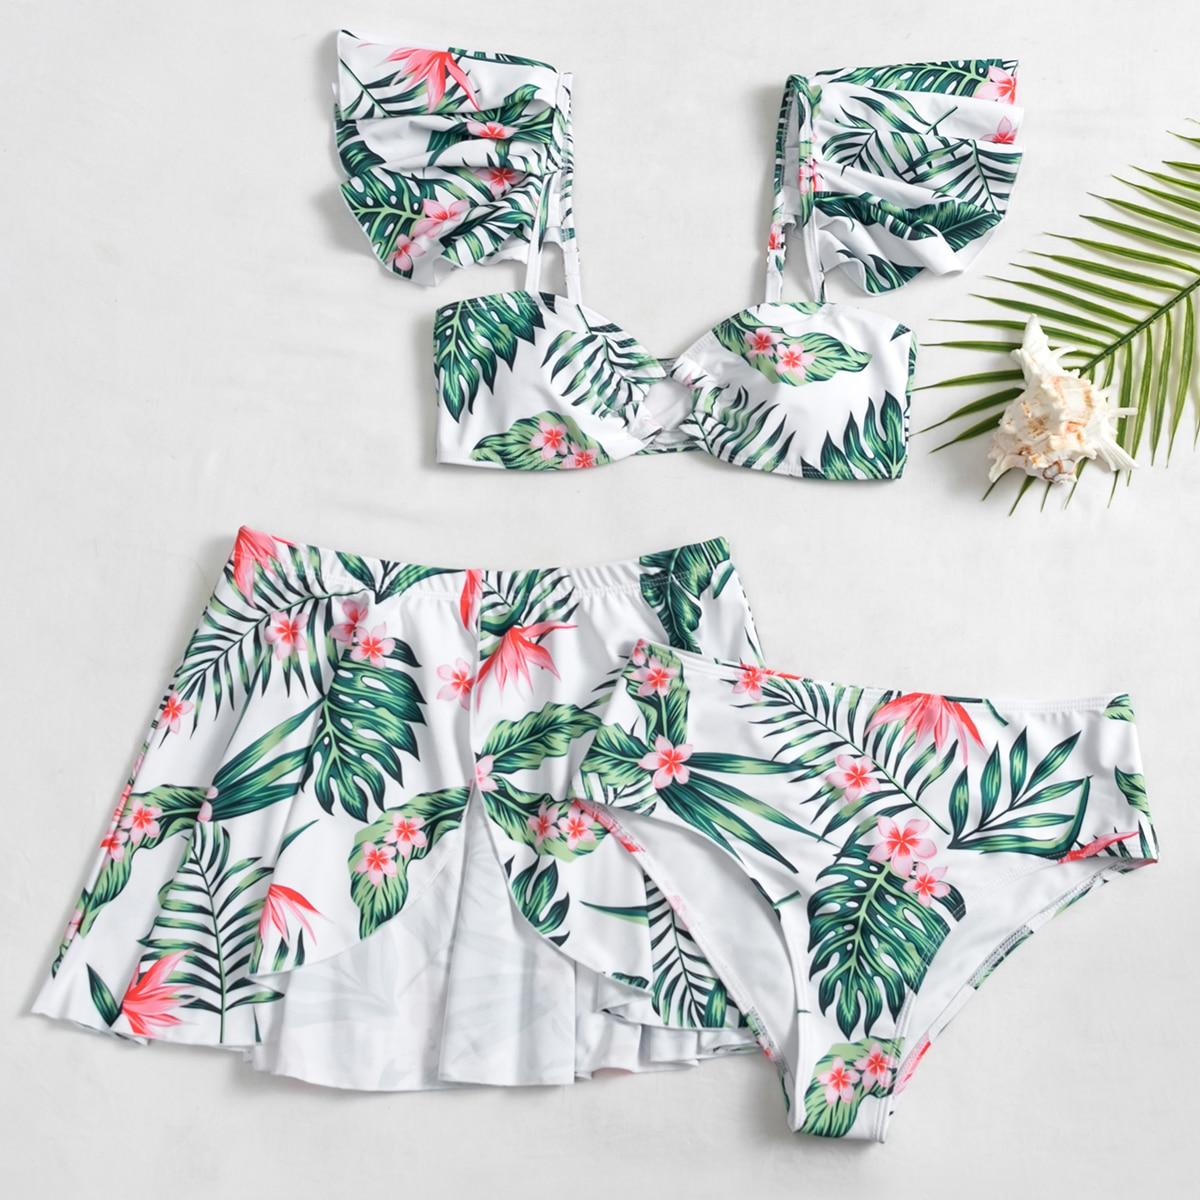 SHEIN / 3pack Floral & Tropical Ruffle Bikini Swimsuit